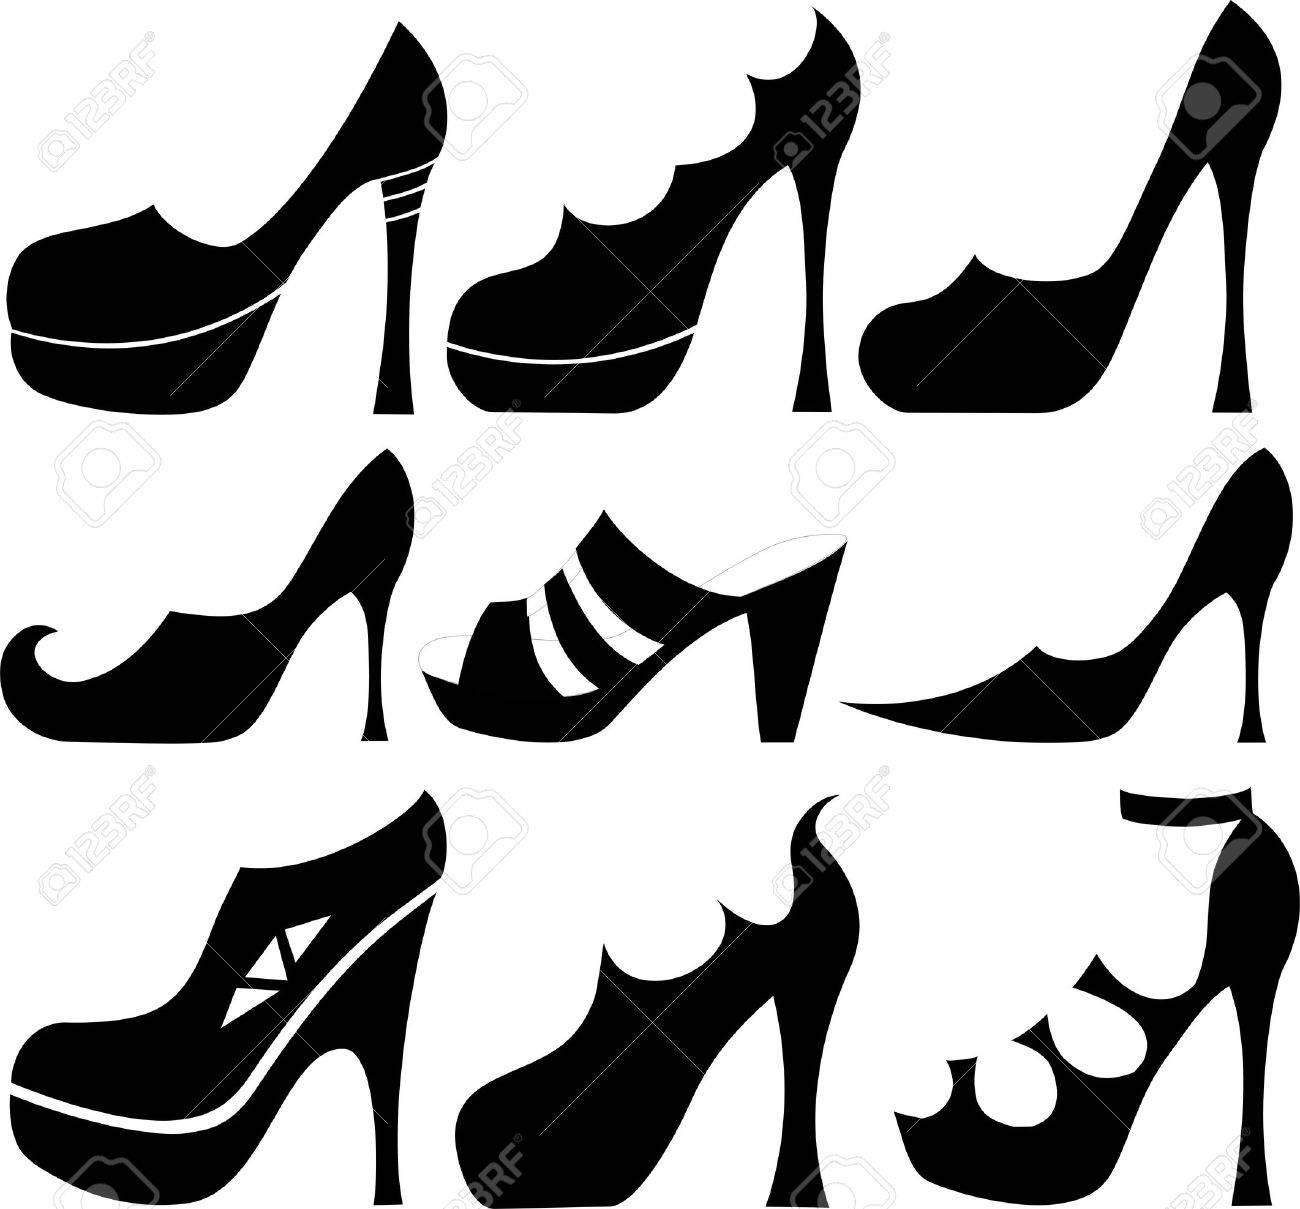 scarpe vector